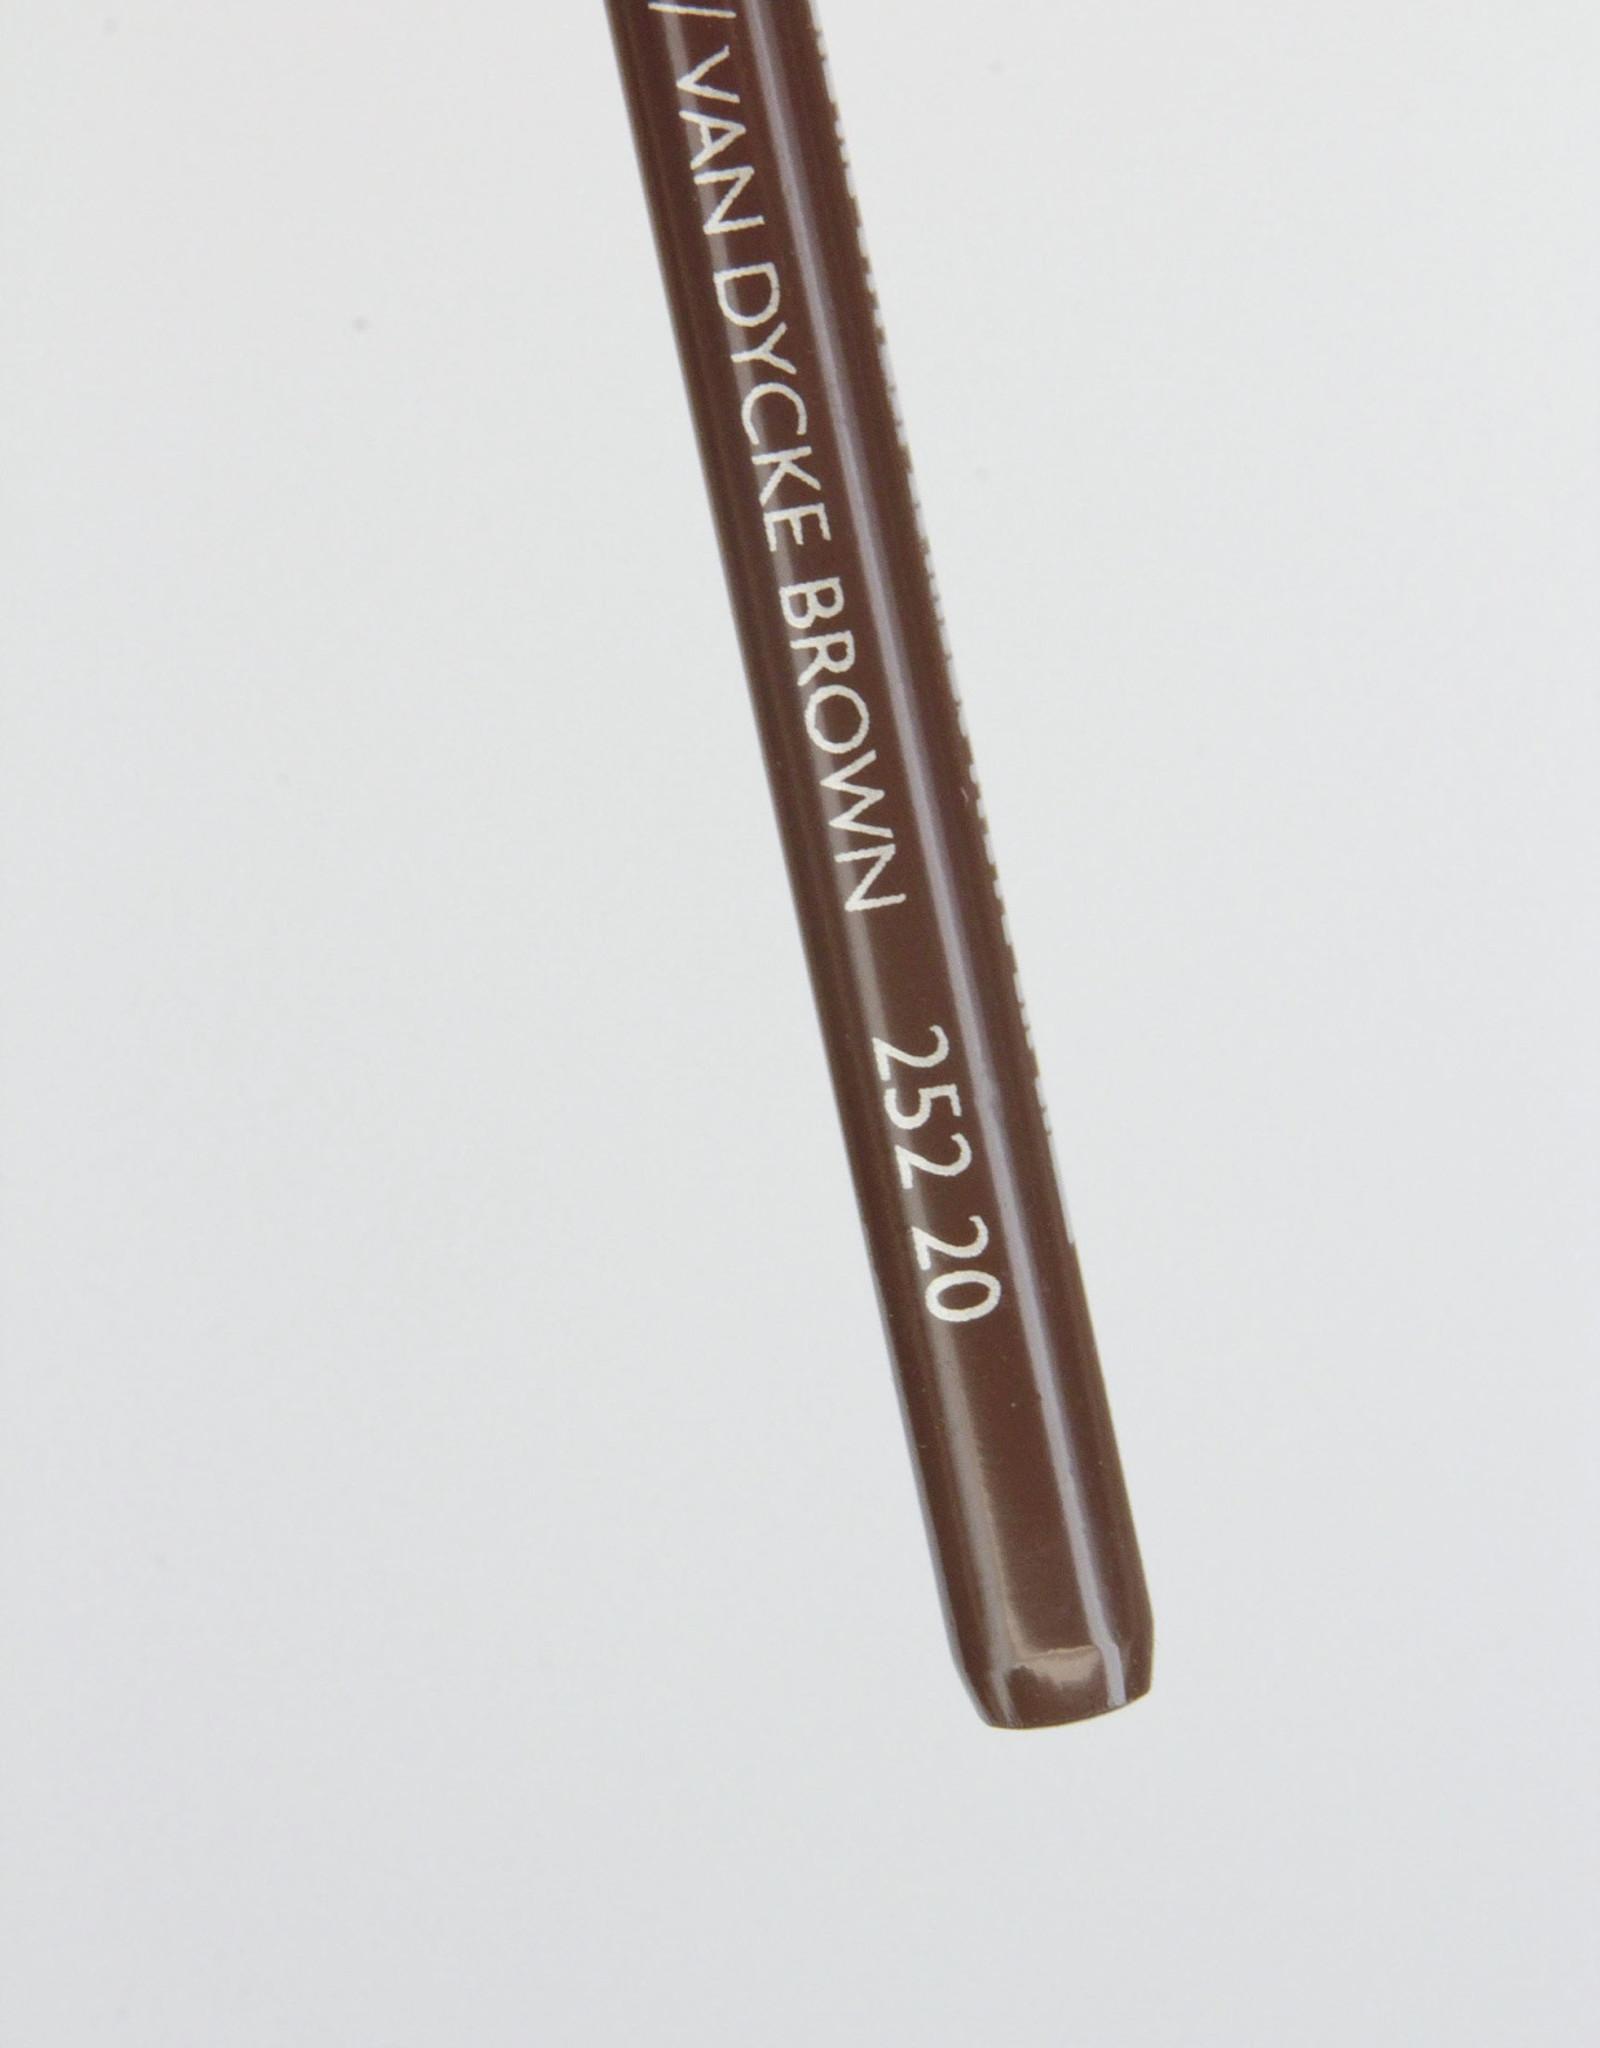 Cretacolor, Aqua Monolith Pencil, Van Dyck Brown